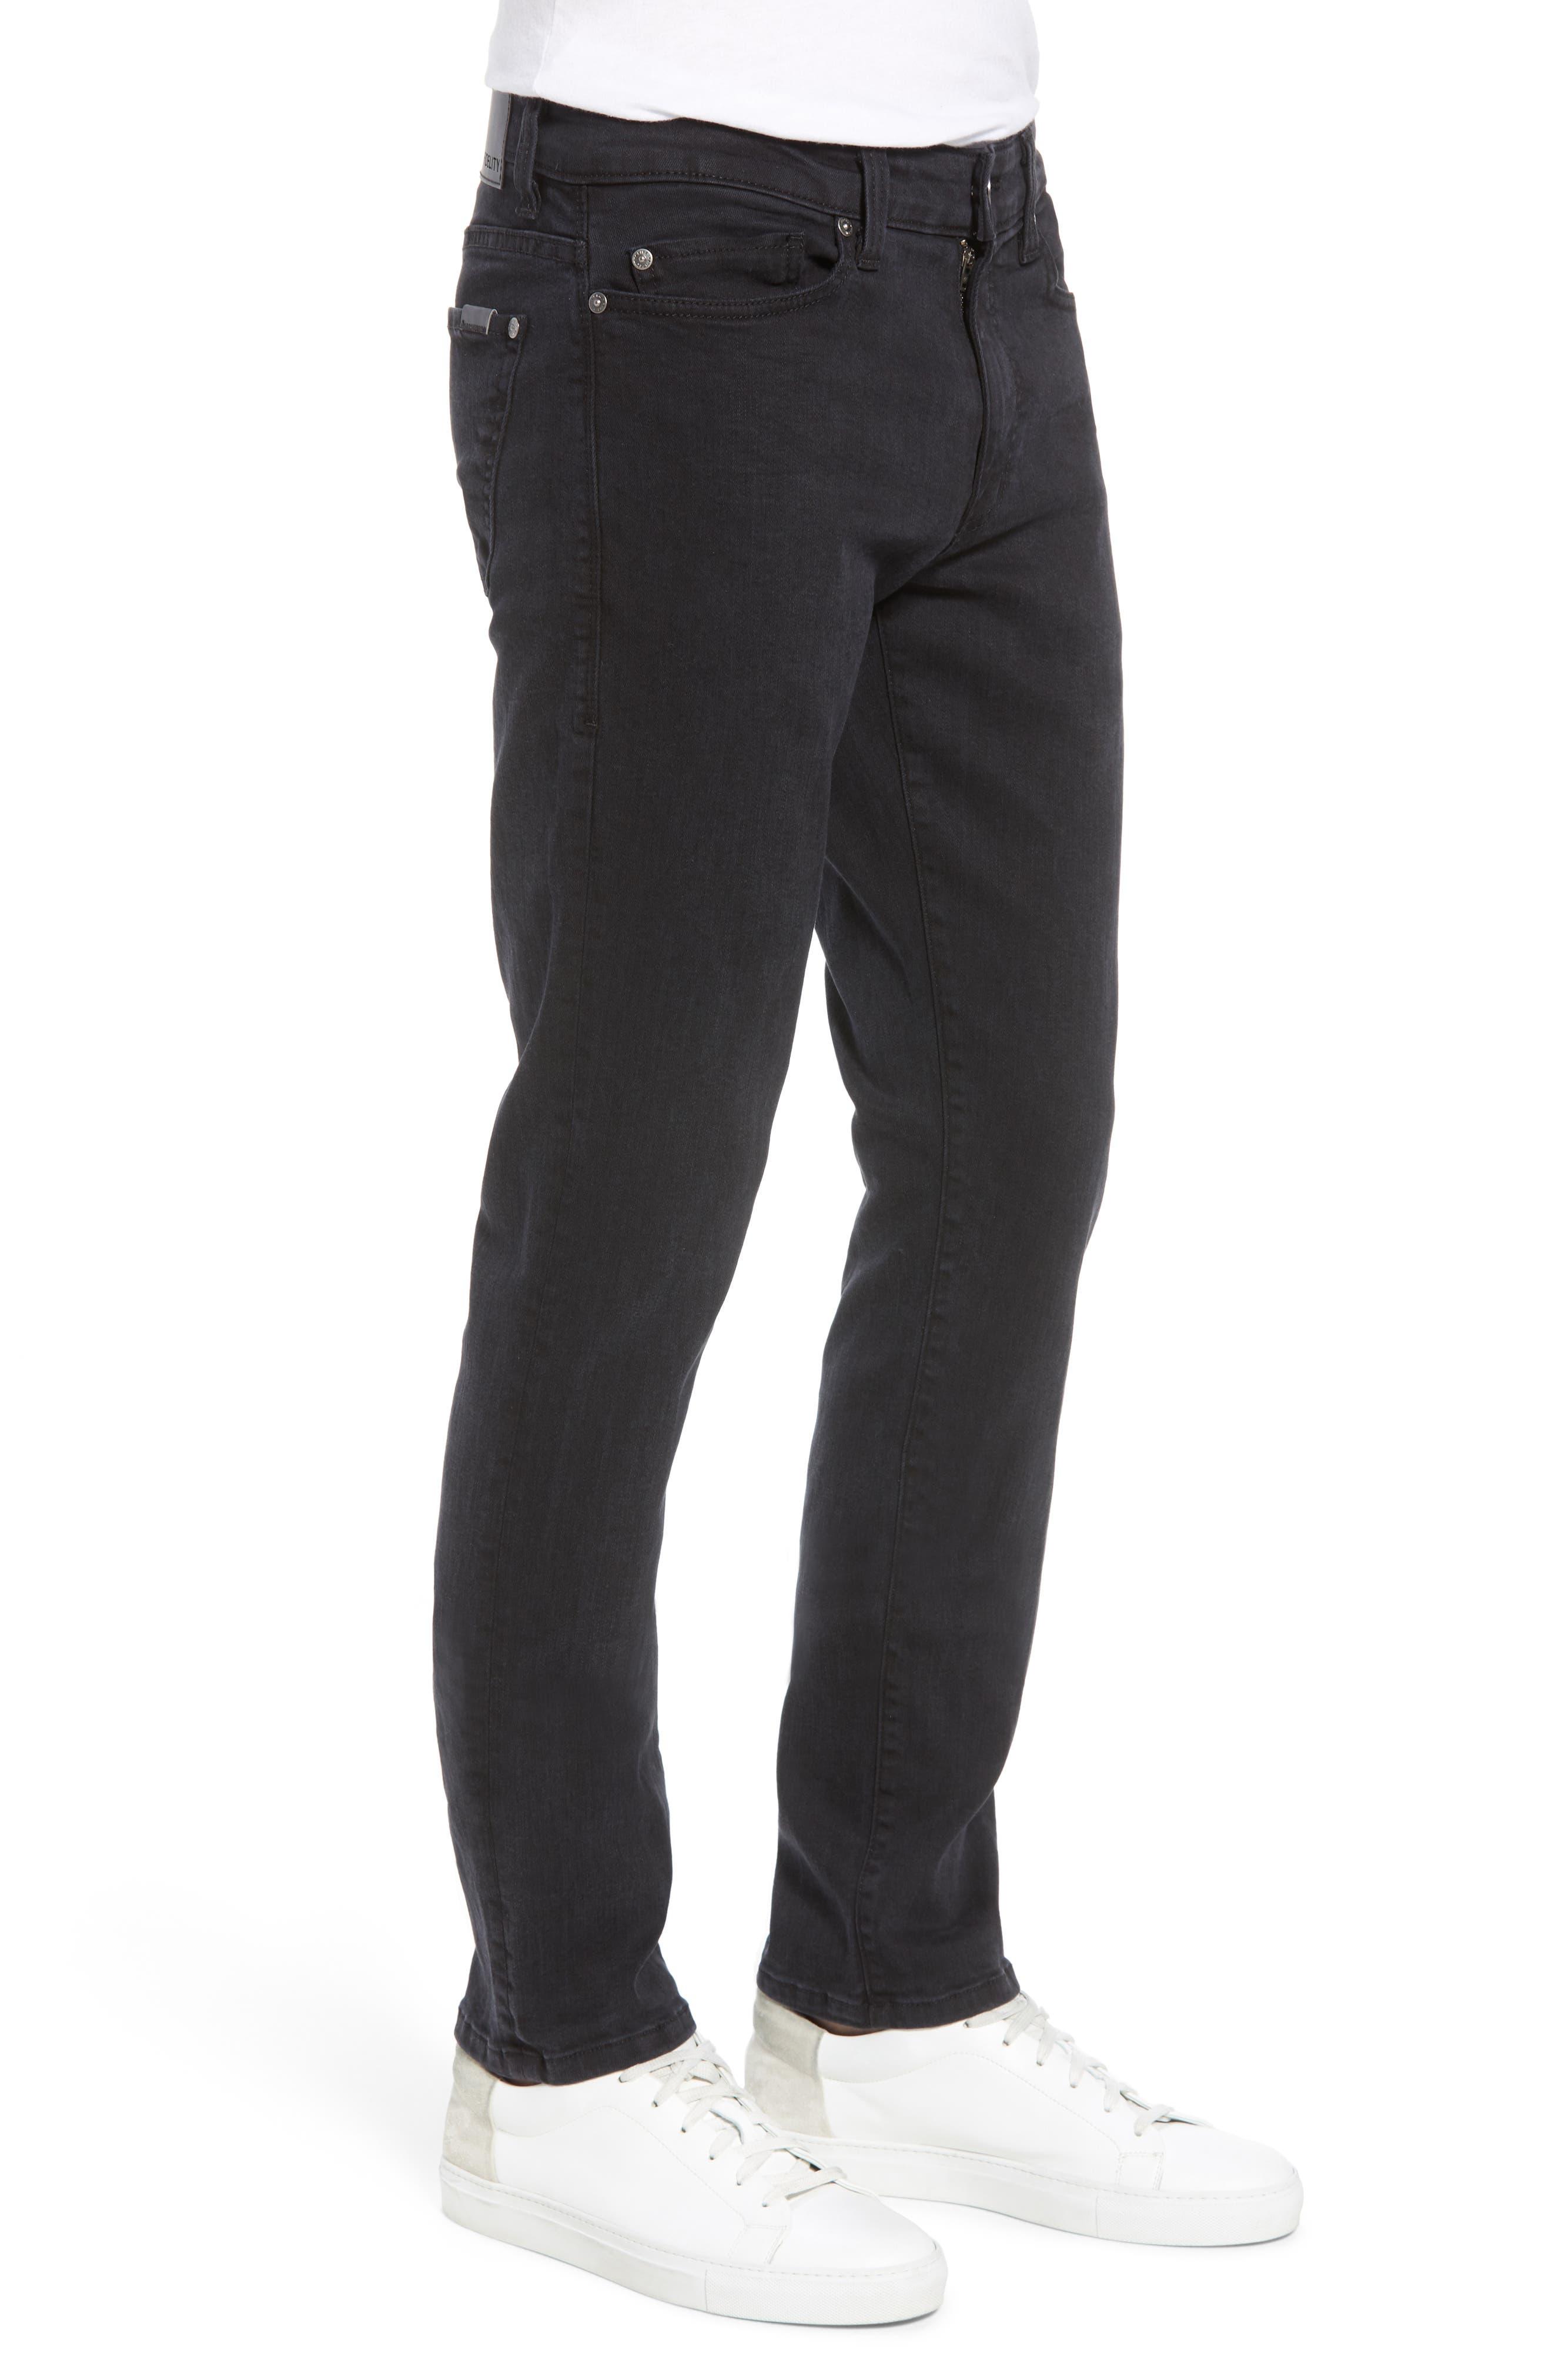 Torino Slim Fit Jeans,                             Alternate thumbnail 3, color,                             001